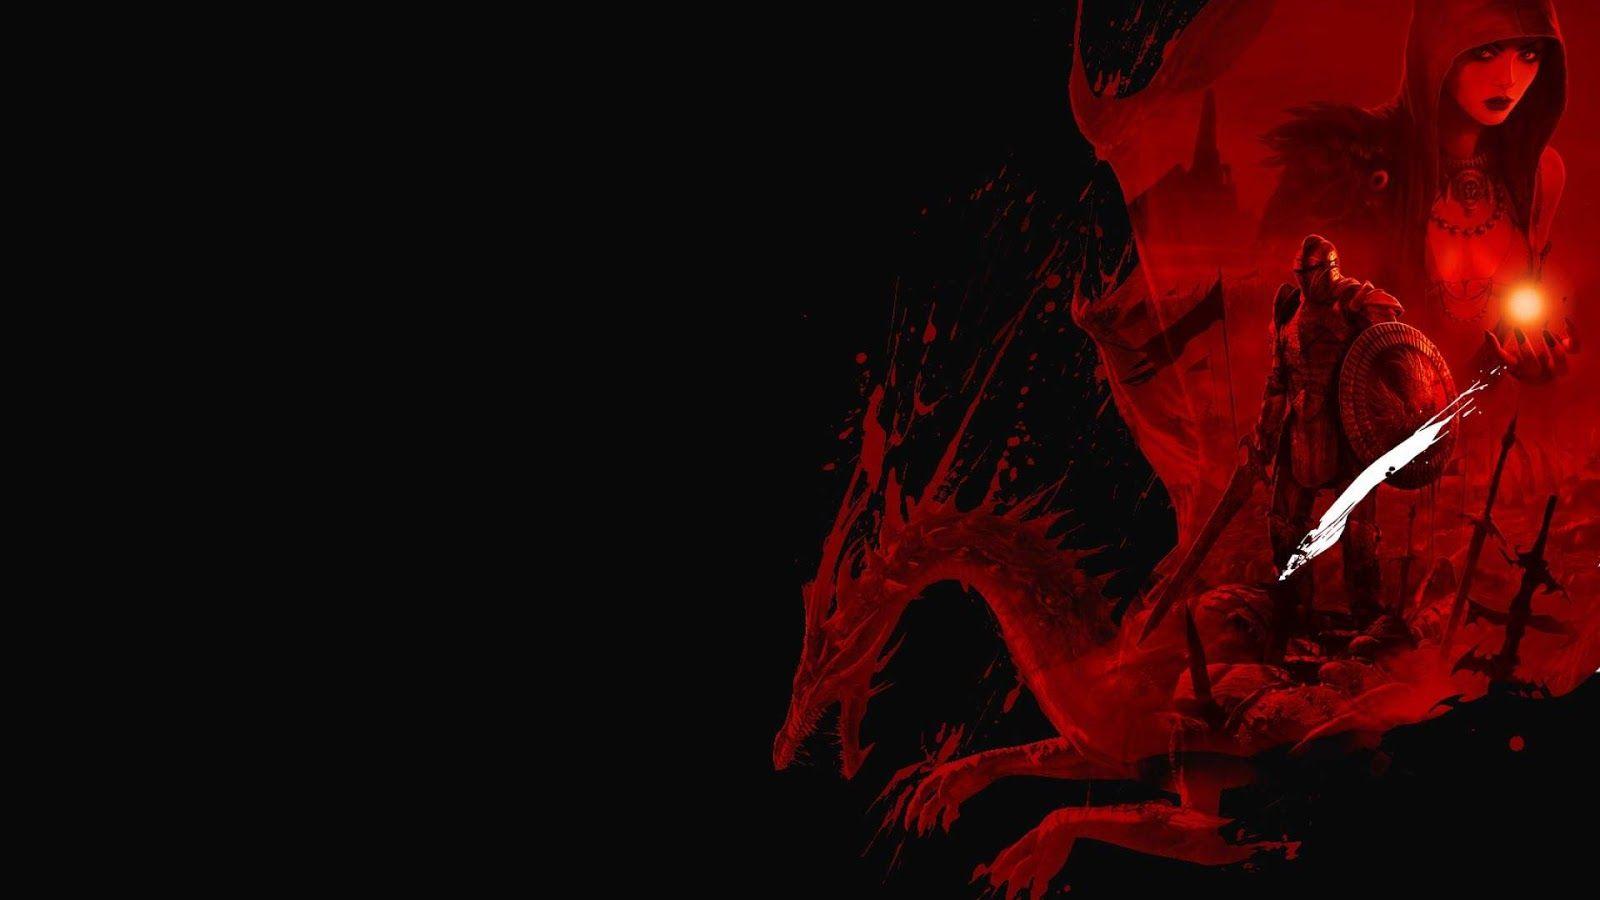 Hd wallpaper dragon - Blood Dragon Hd Wallpaper Free 4469 Wallpaper Gamejetz Com